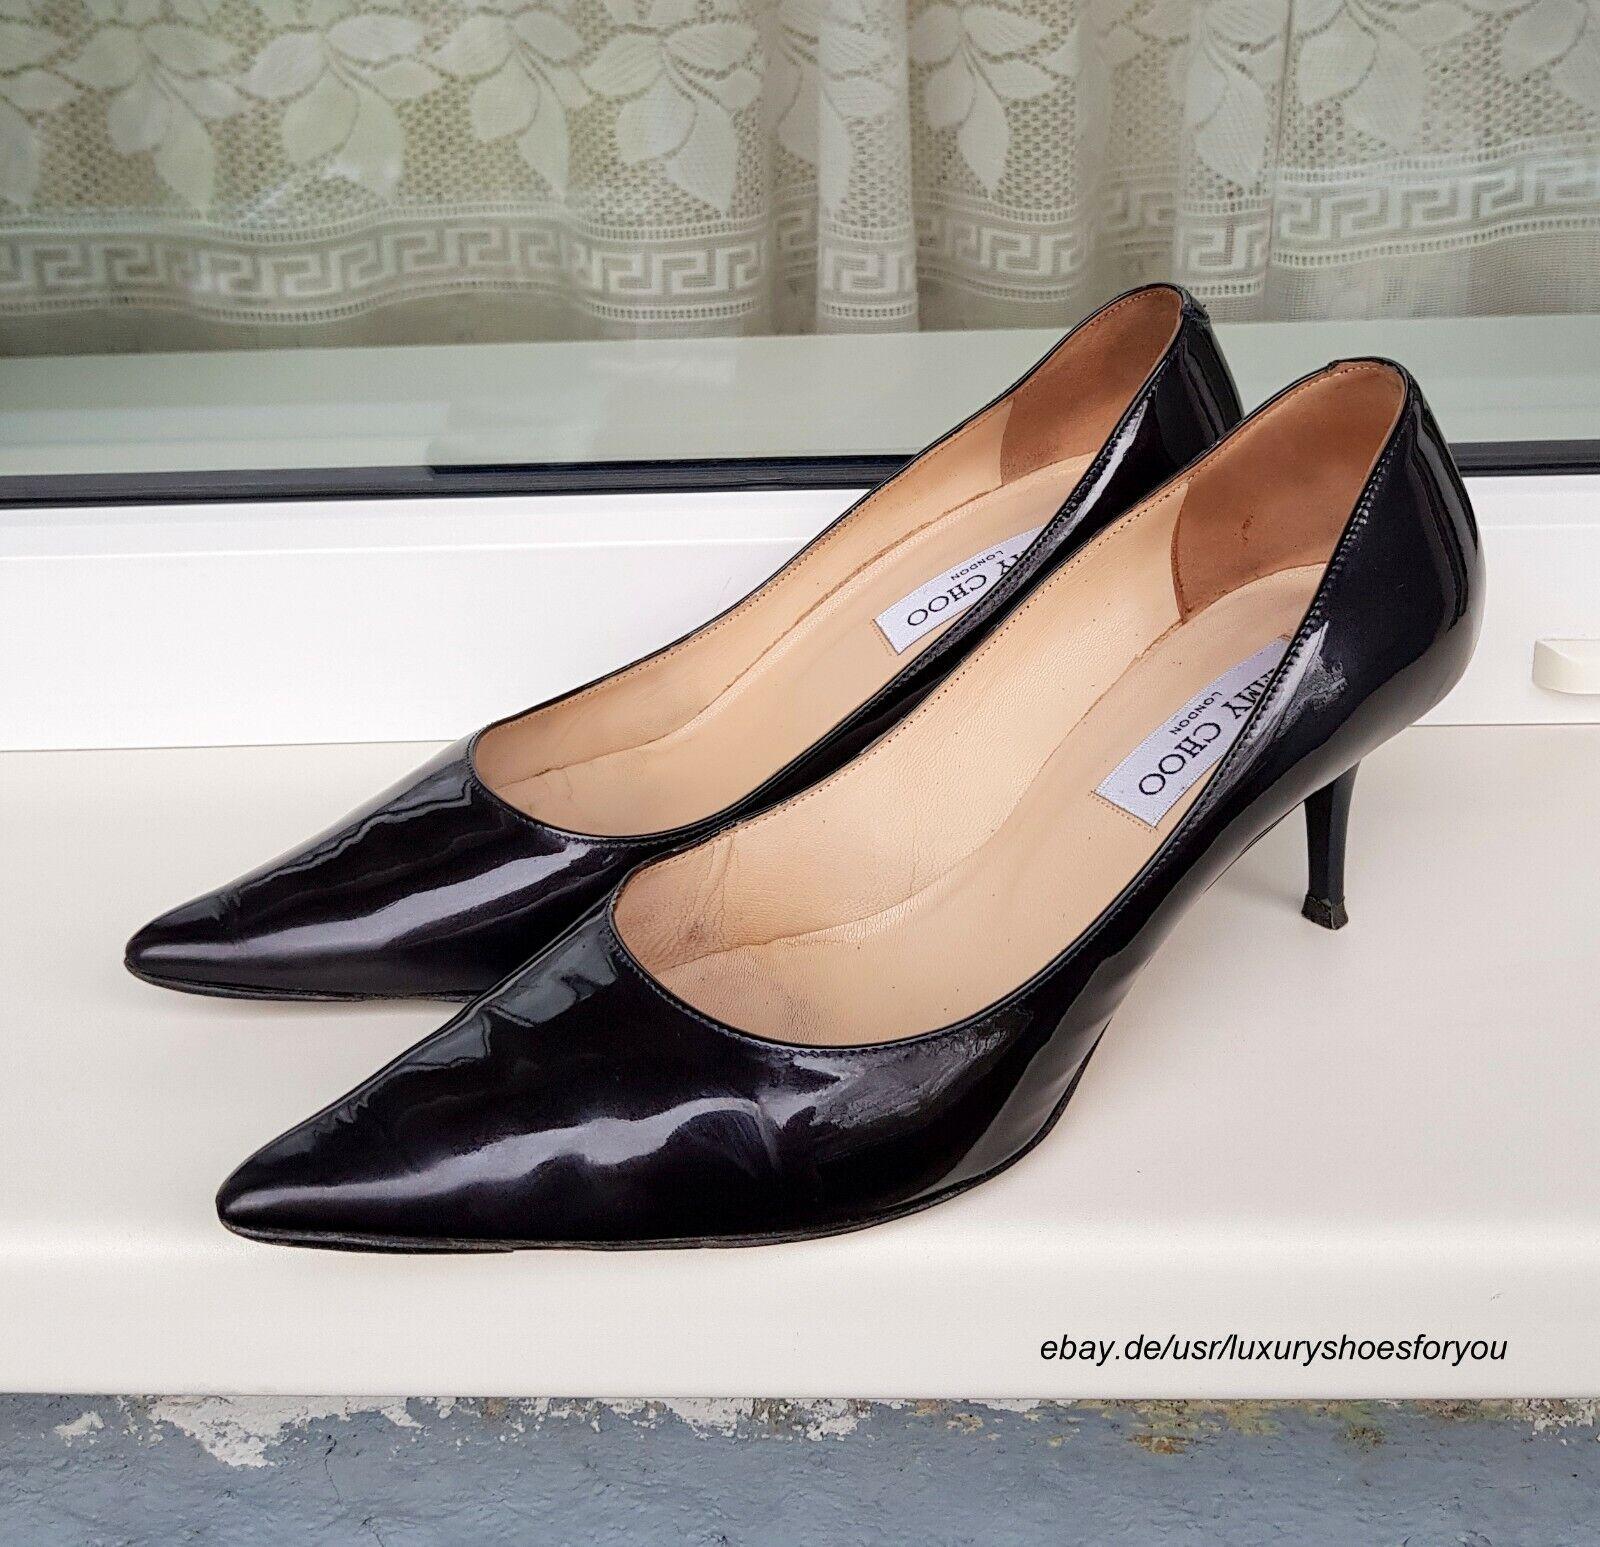 Jimmy Choo viola Patent  Leather Heels Dimensione 39.5.  negozio online